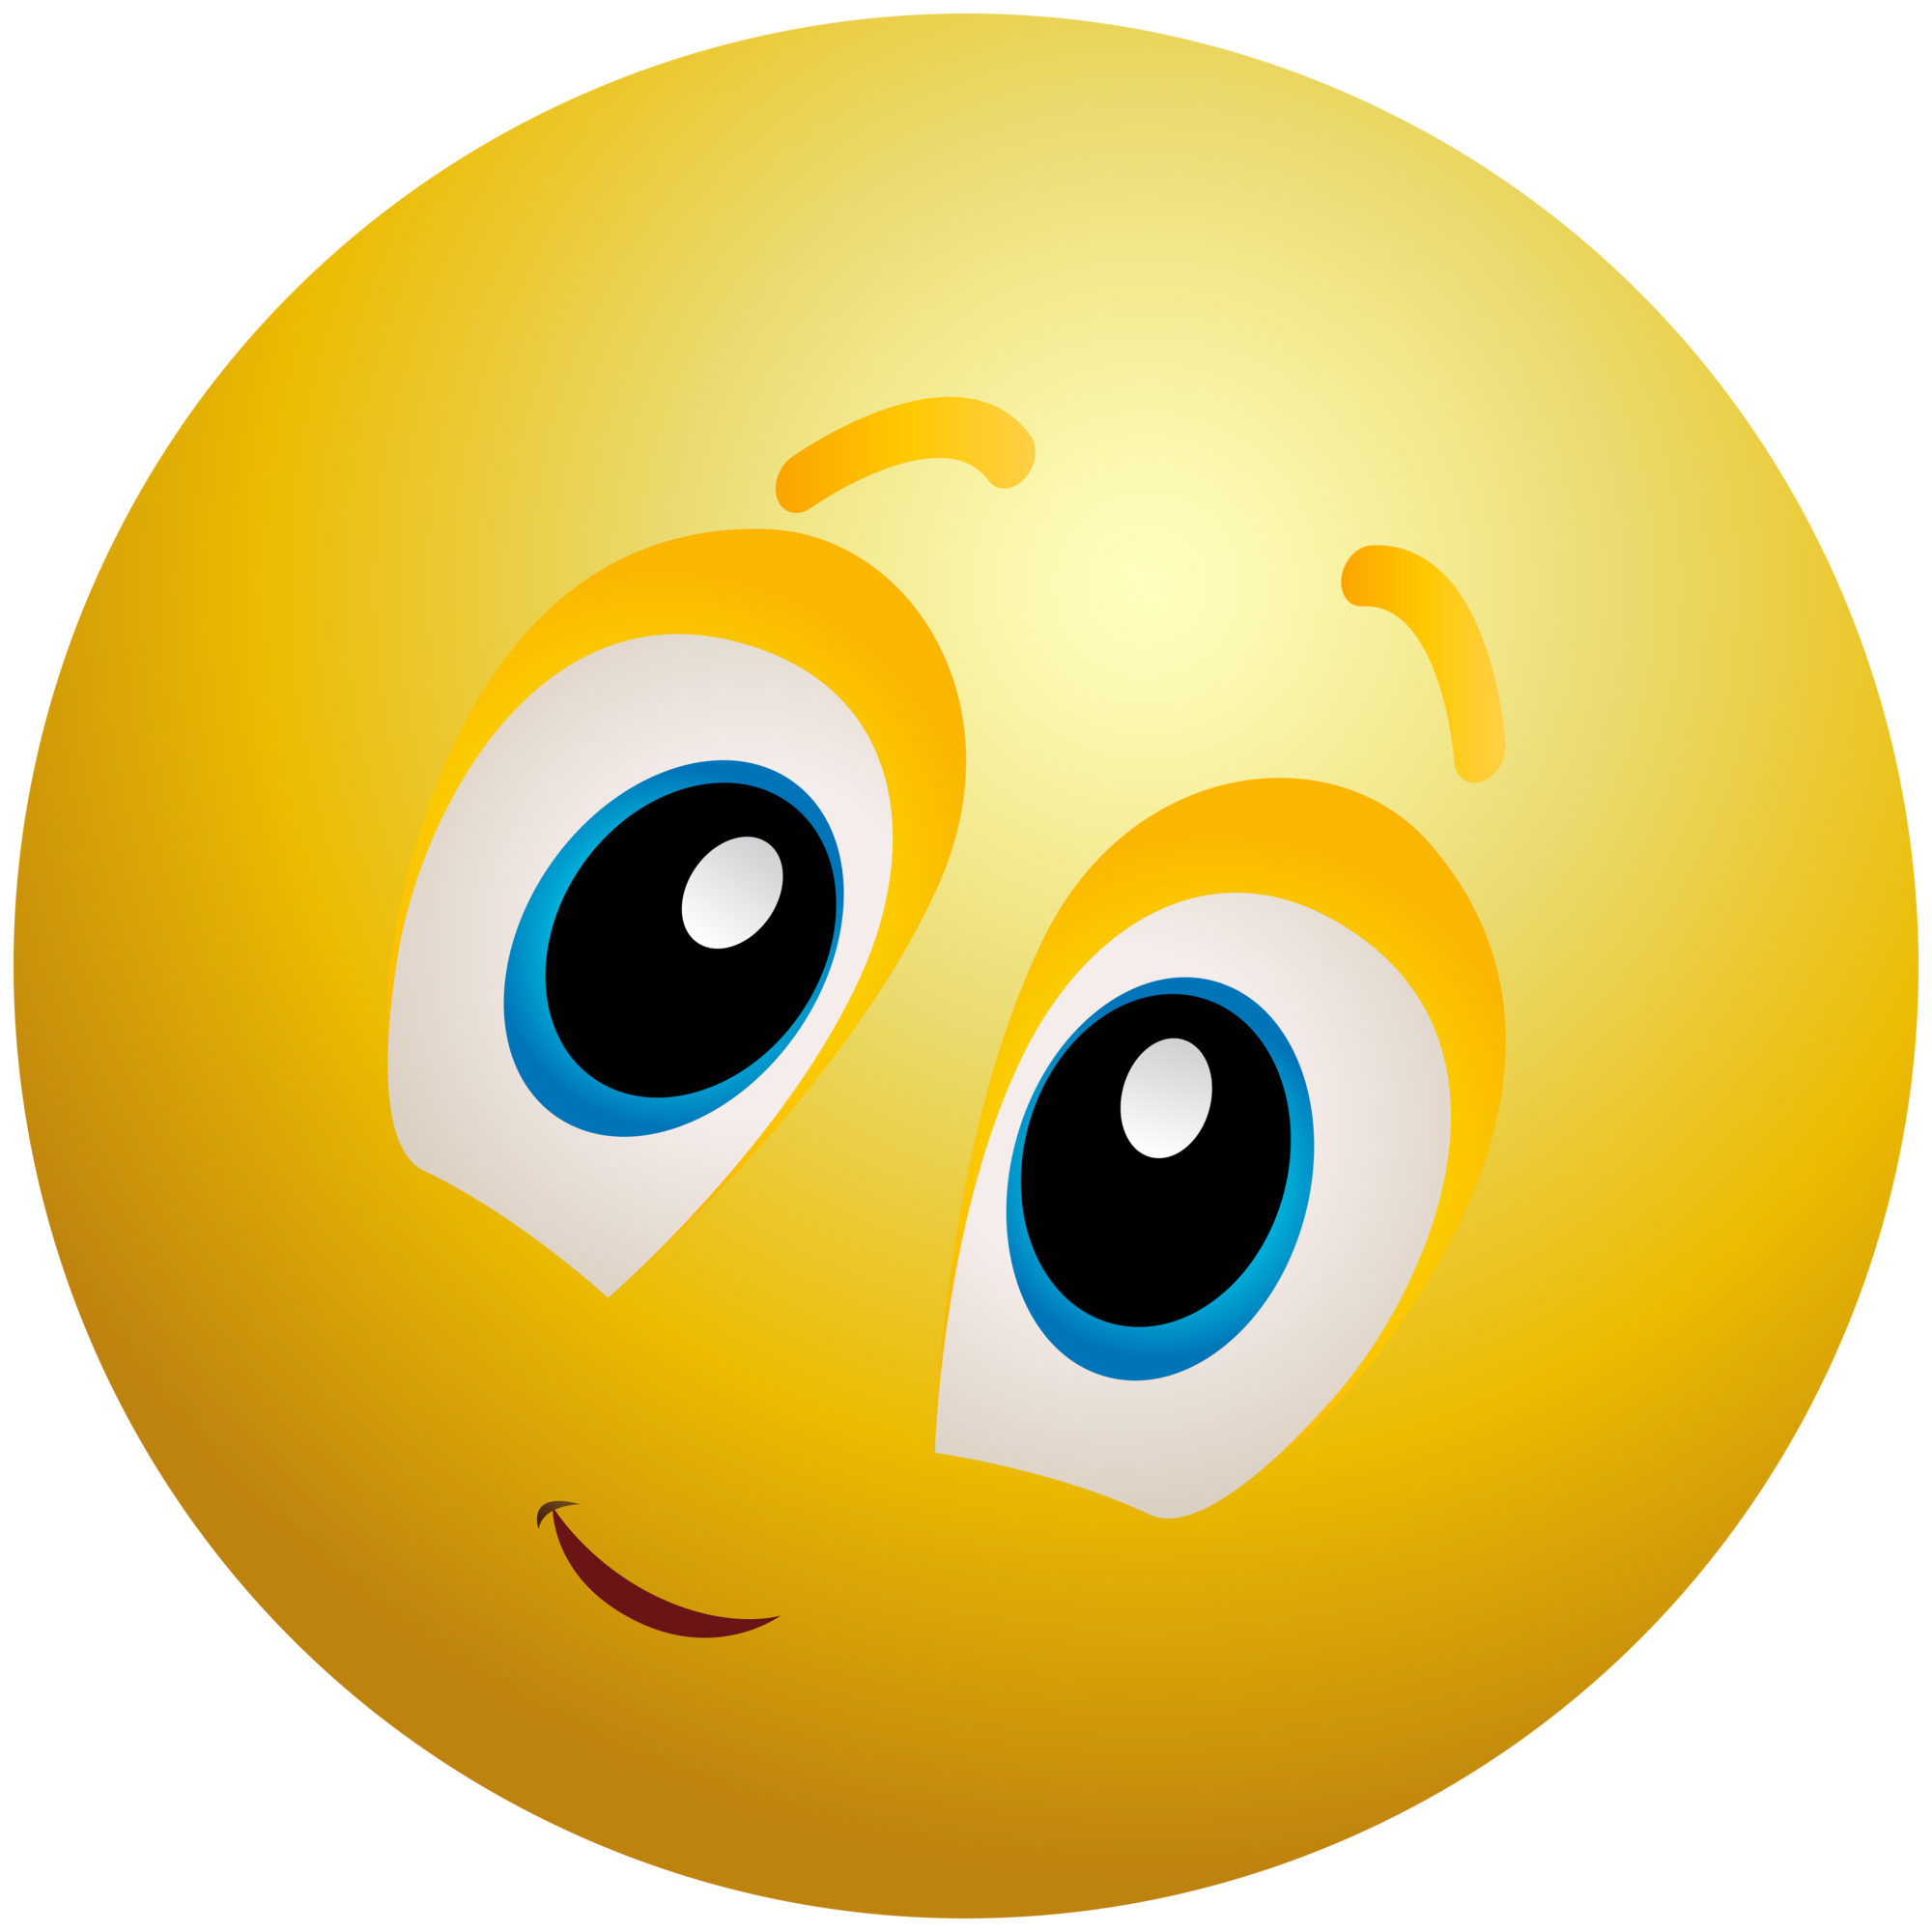 Kindly face emoticon emoji. Clipart smile crooked smile